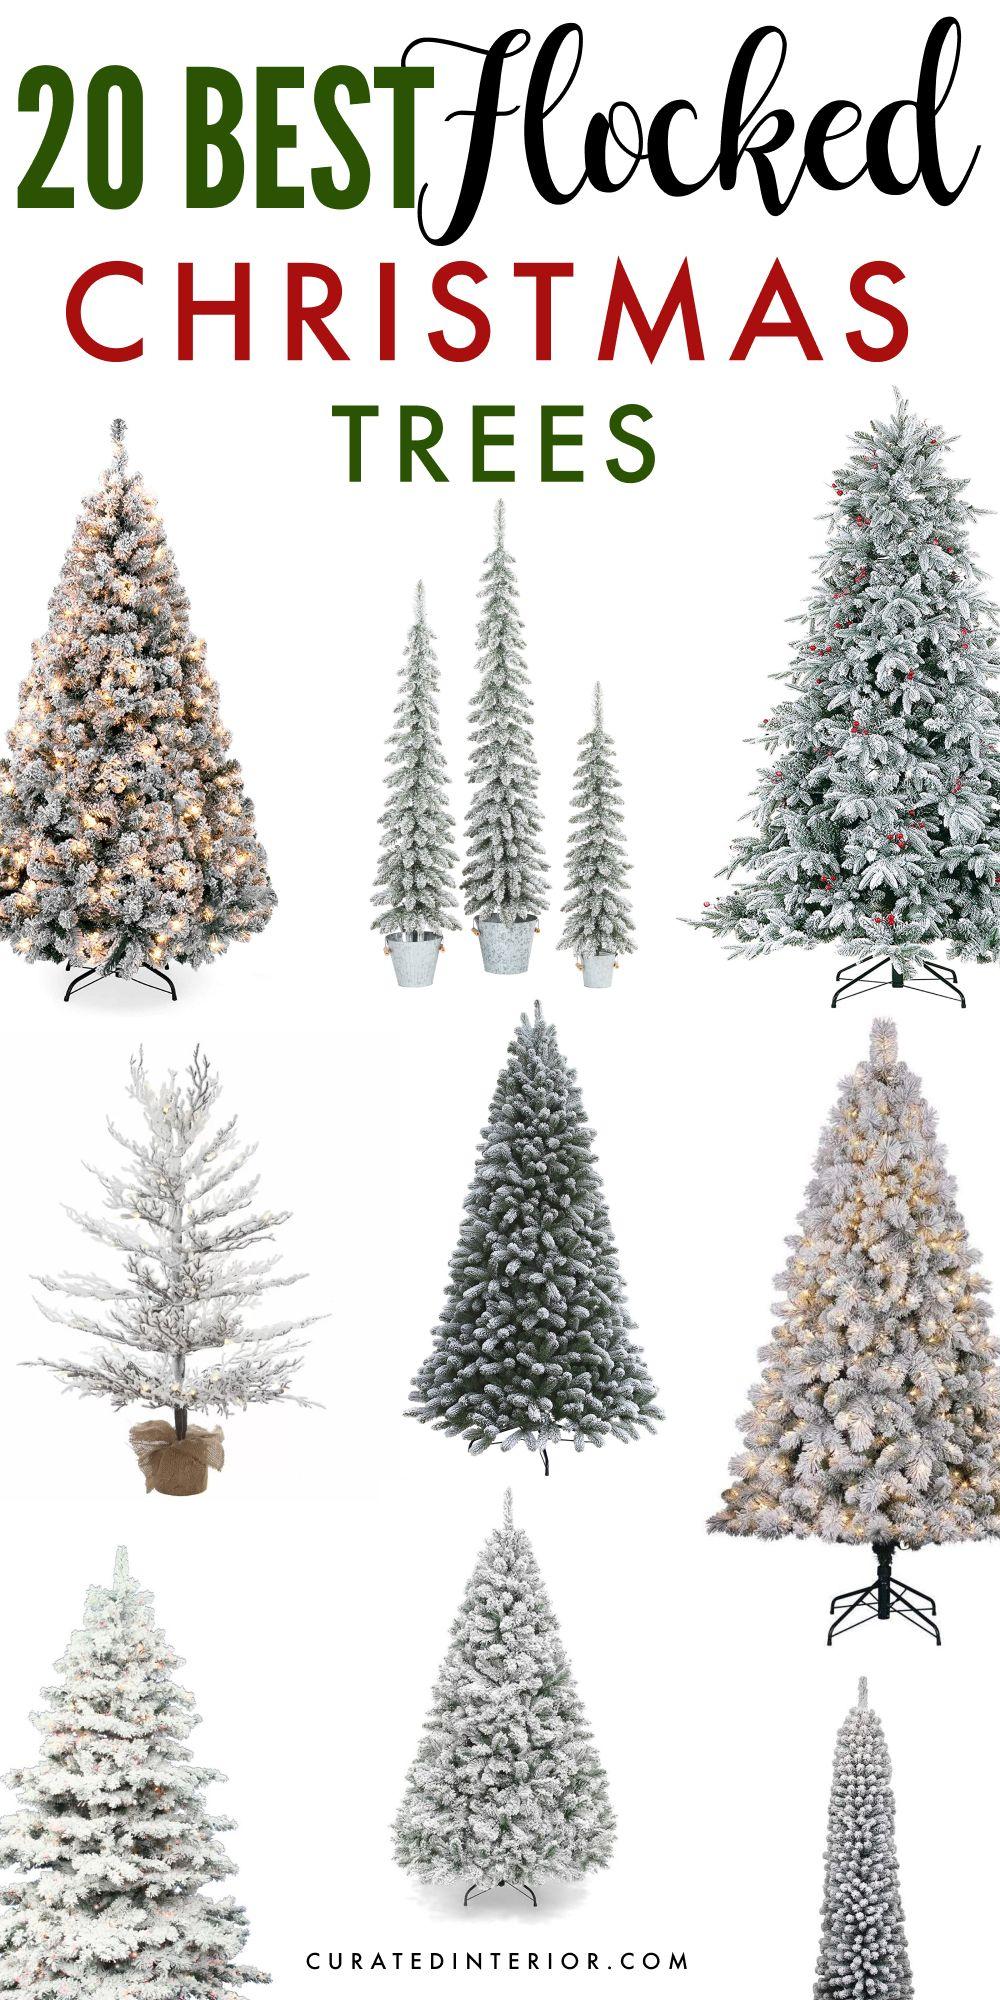 20 Best Flocked Christmas Trees